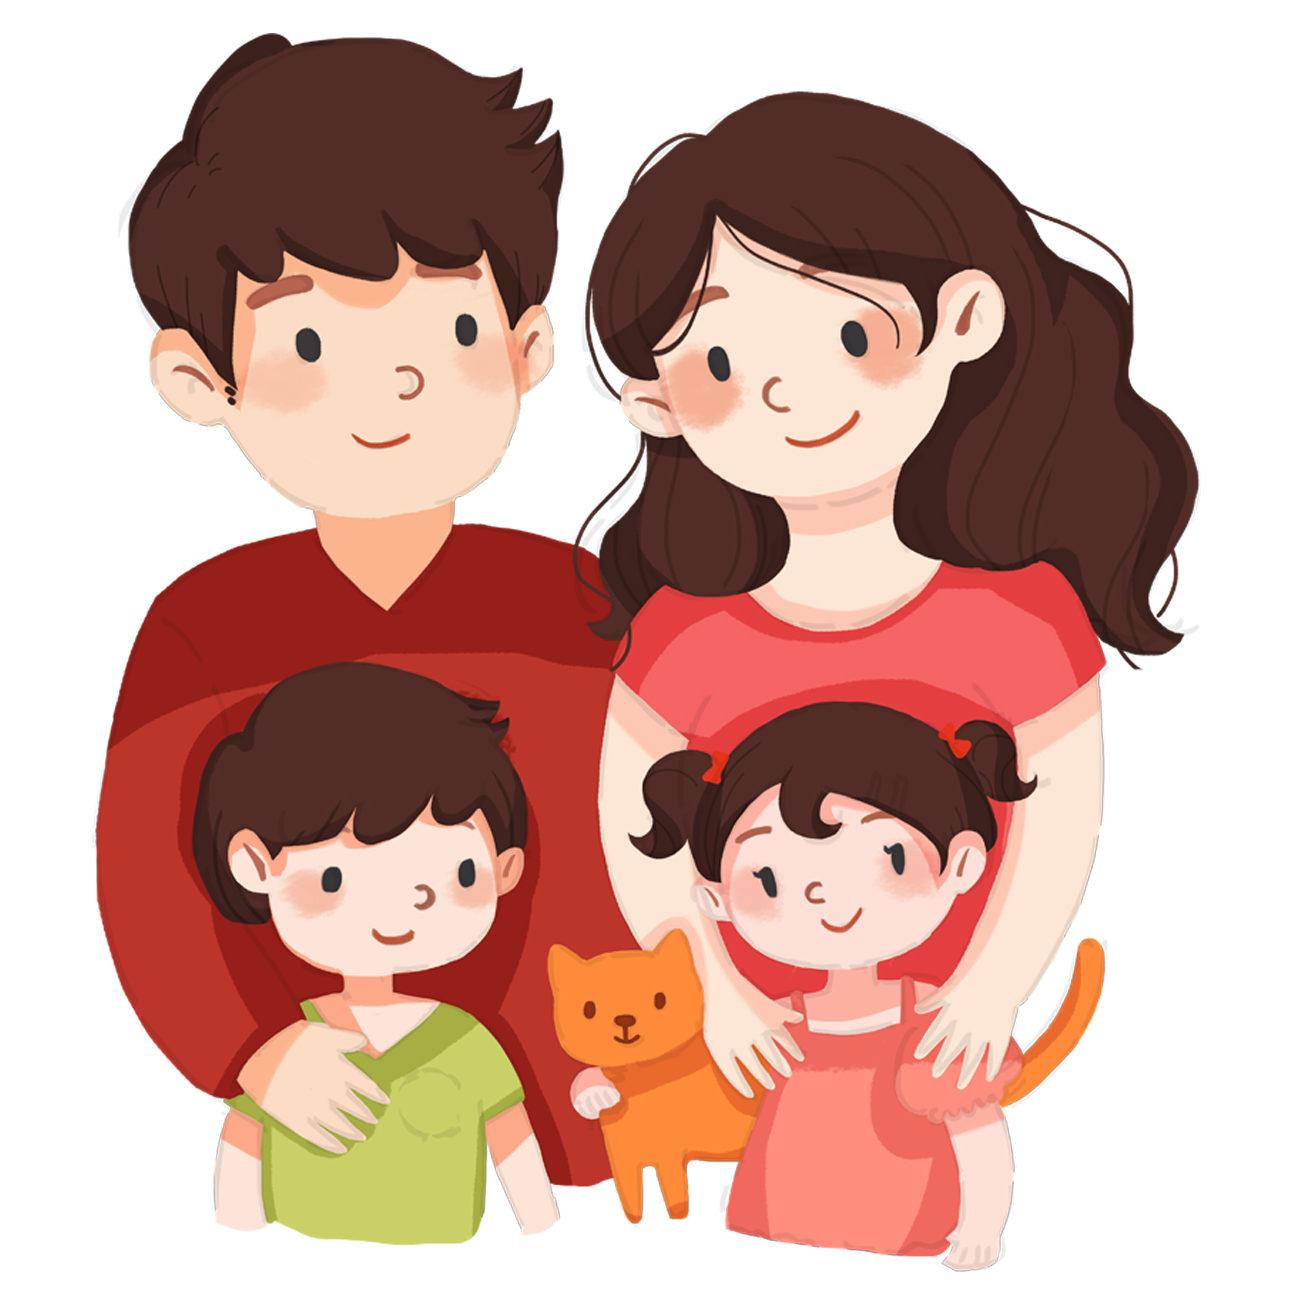 famille4 fd blc